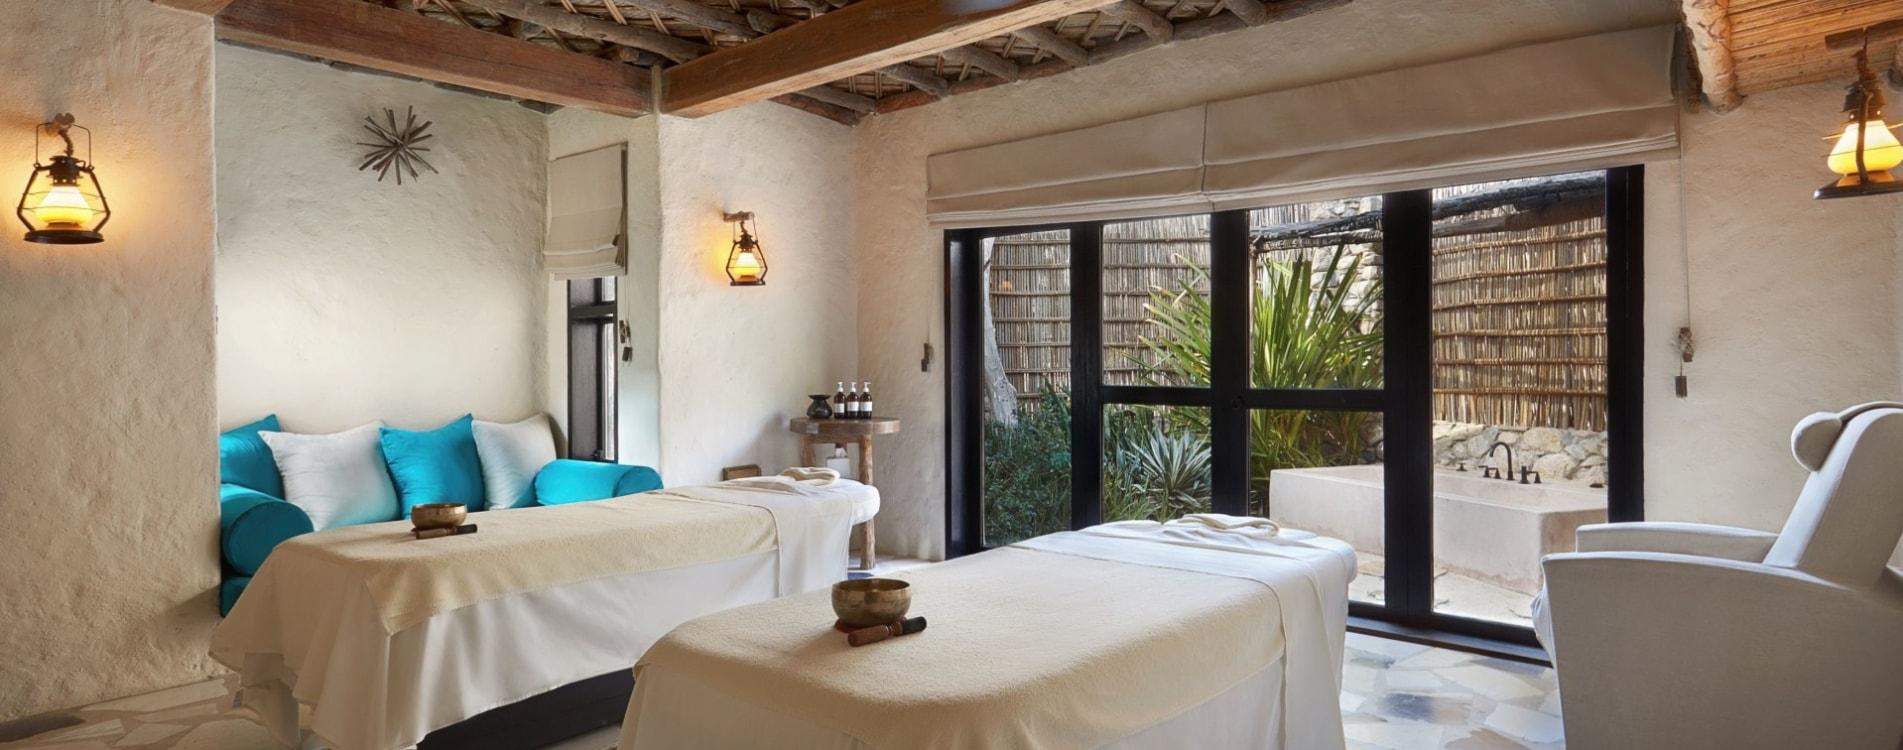 Six-Senses-Zighy-Bay-Spa-Behandlungszimmer-Massage-Oman.jpg